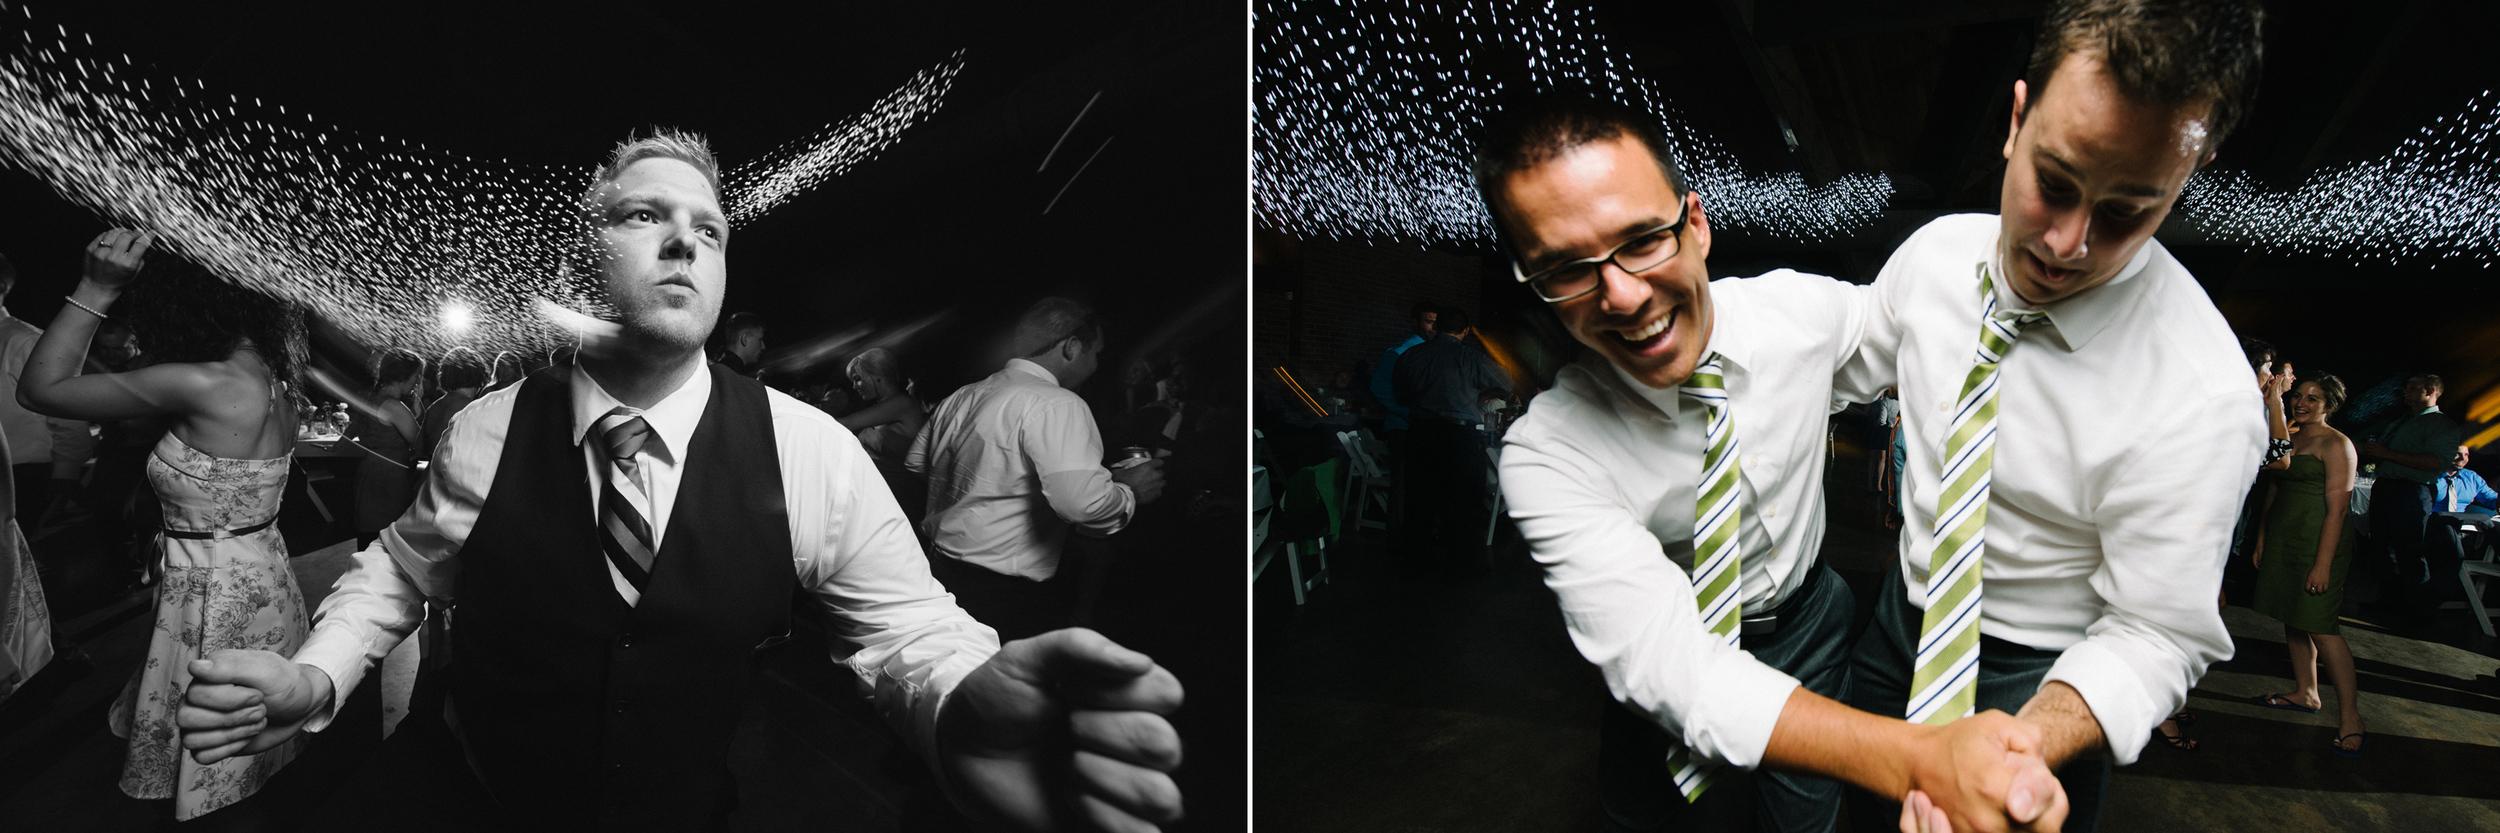 Matt_Swetel_Photography_Erin_and_Jeff_FB1053.jpg